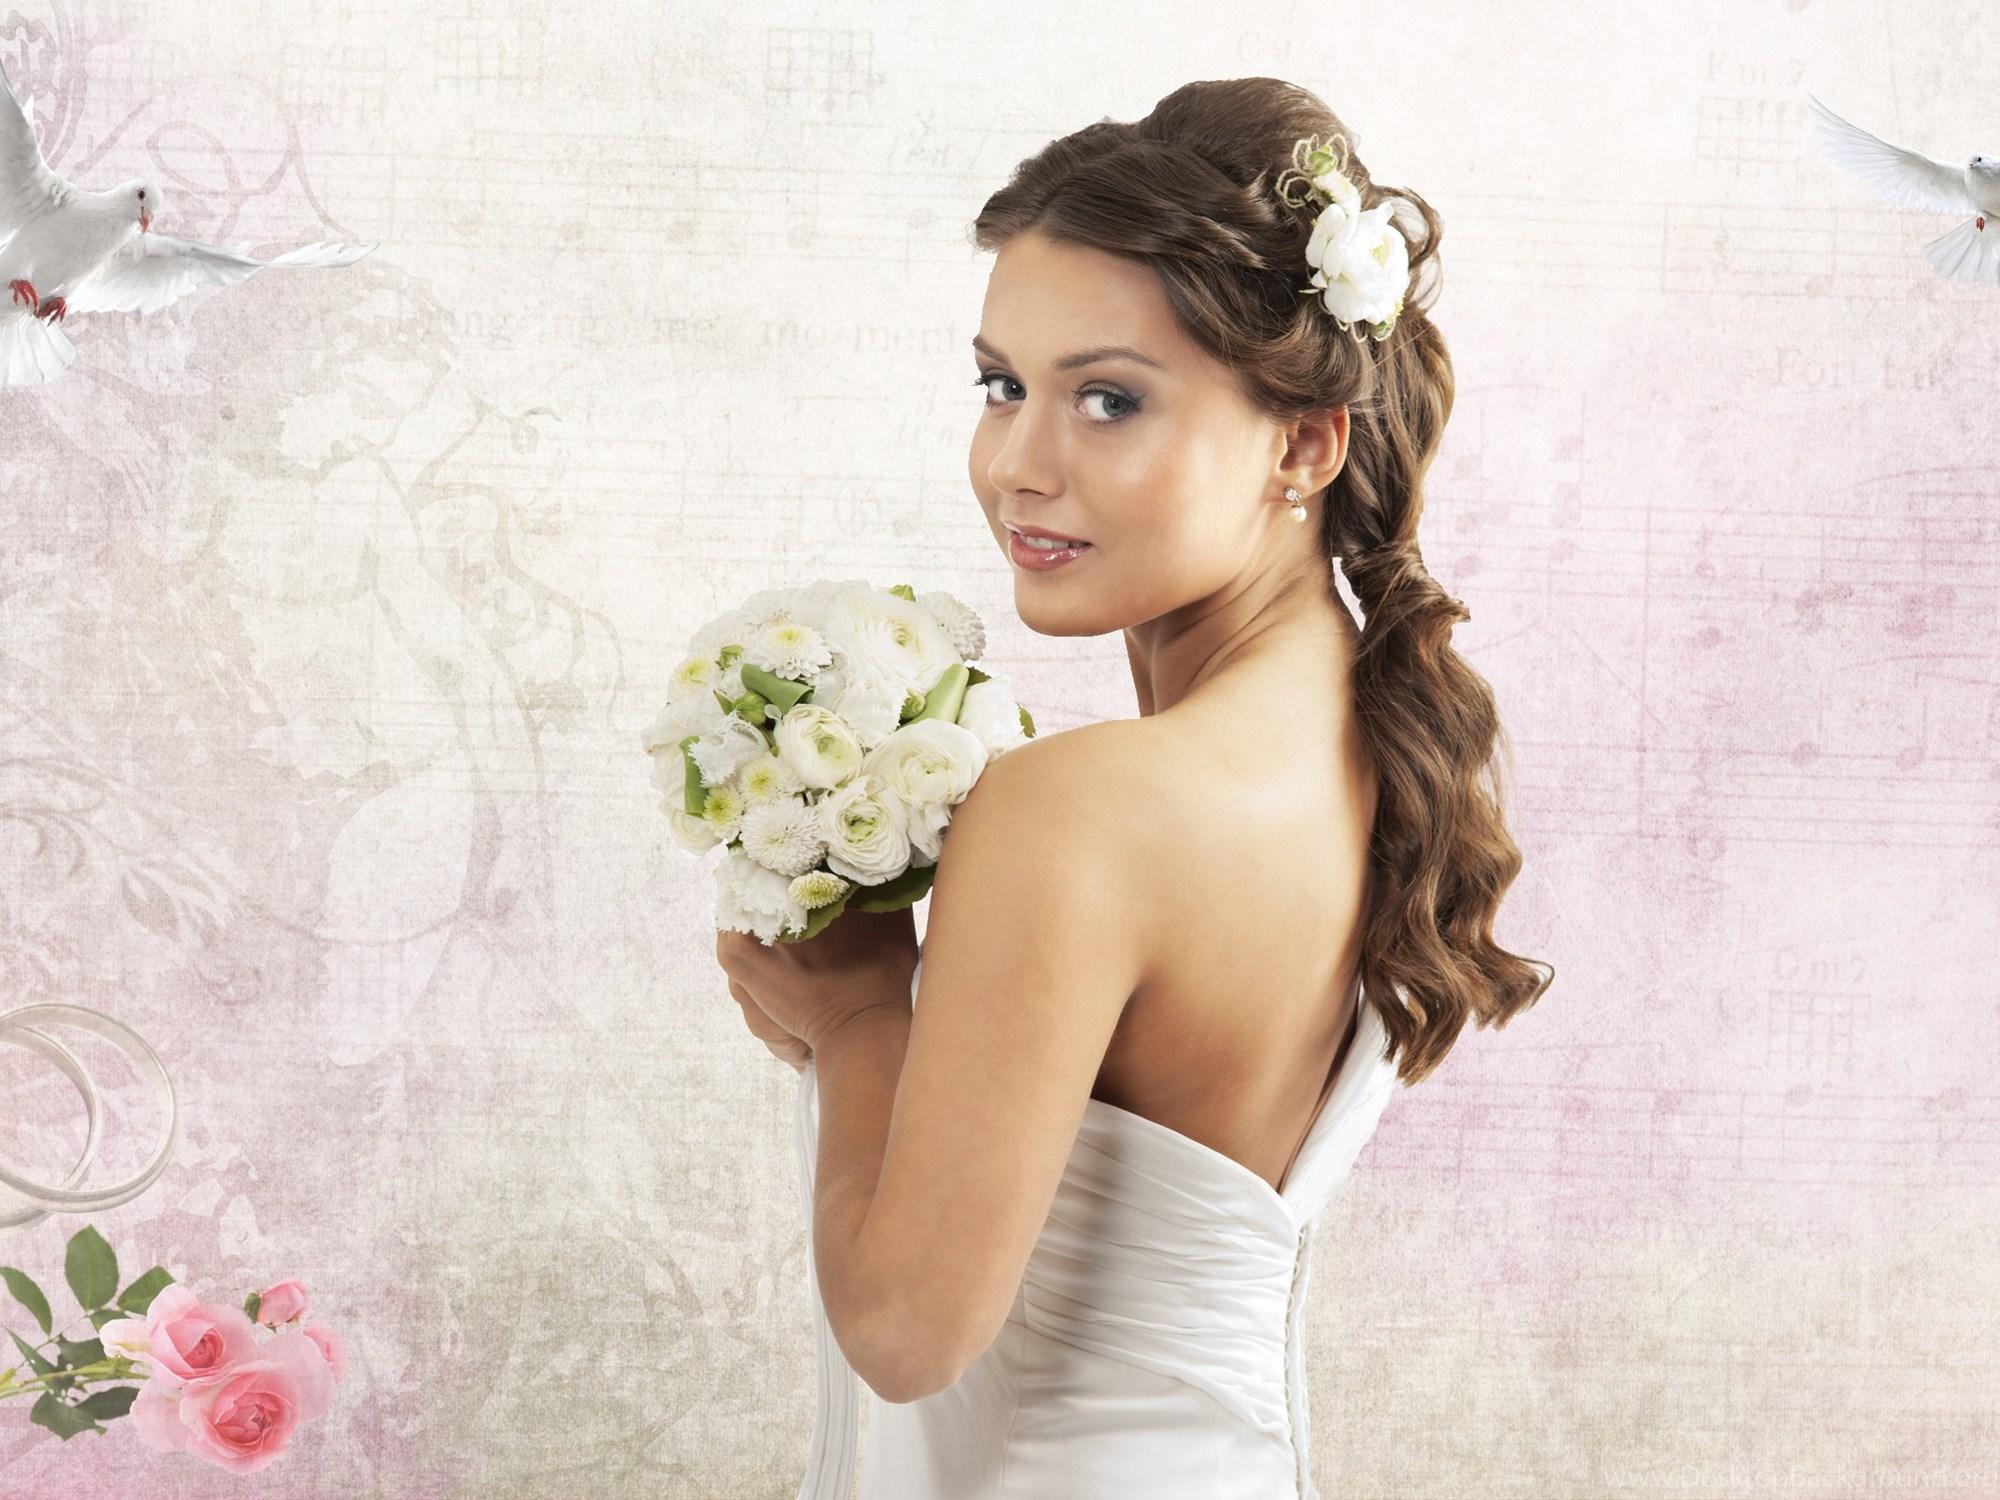 Steffans movie beautiful teen brides alcohol